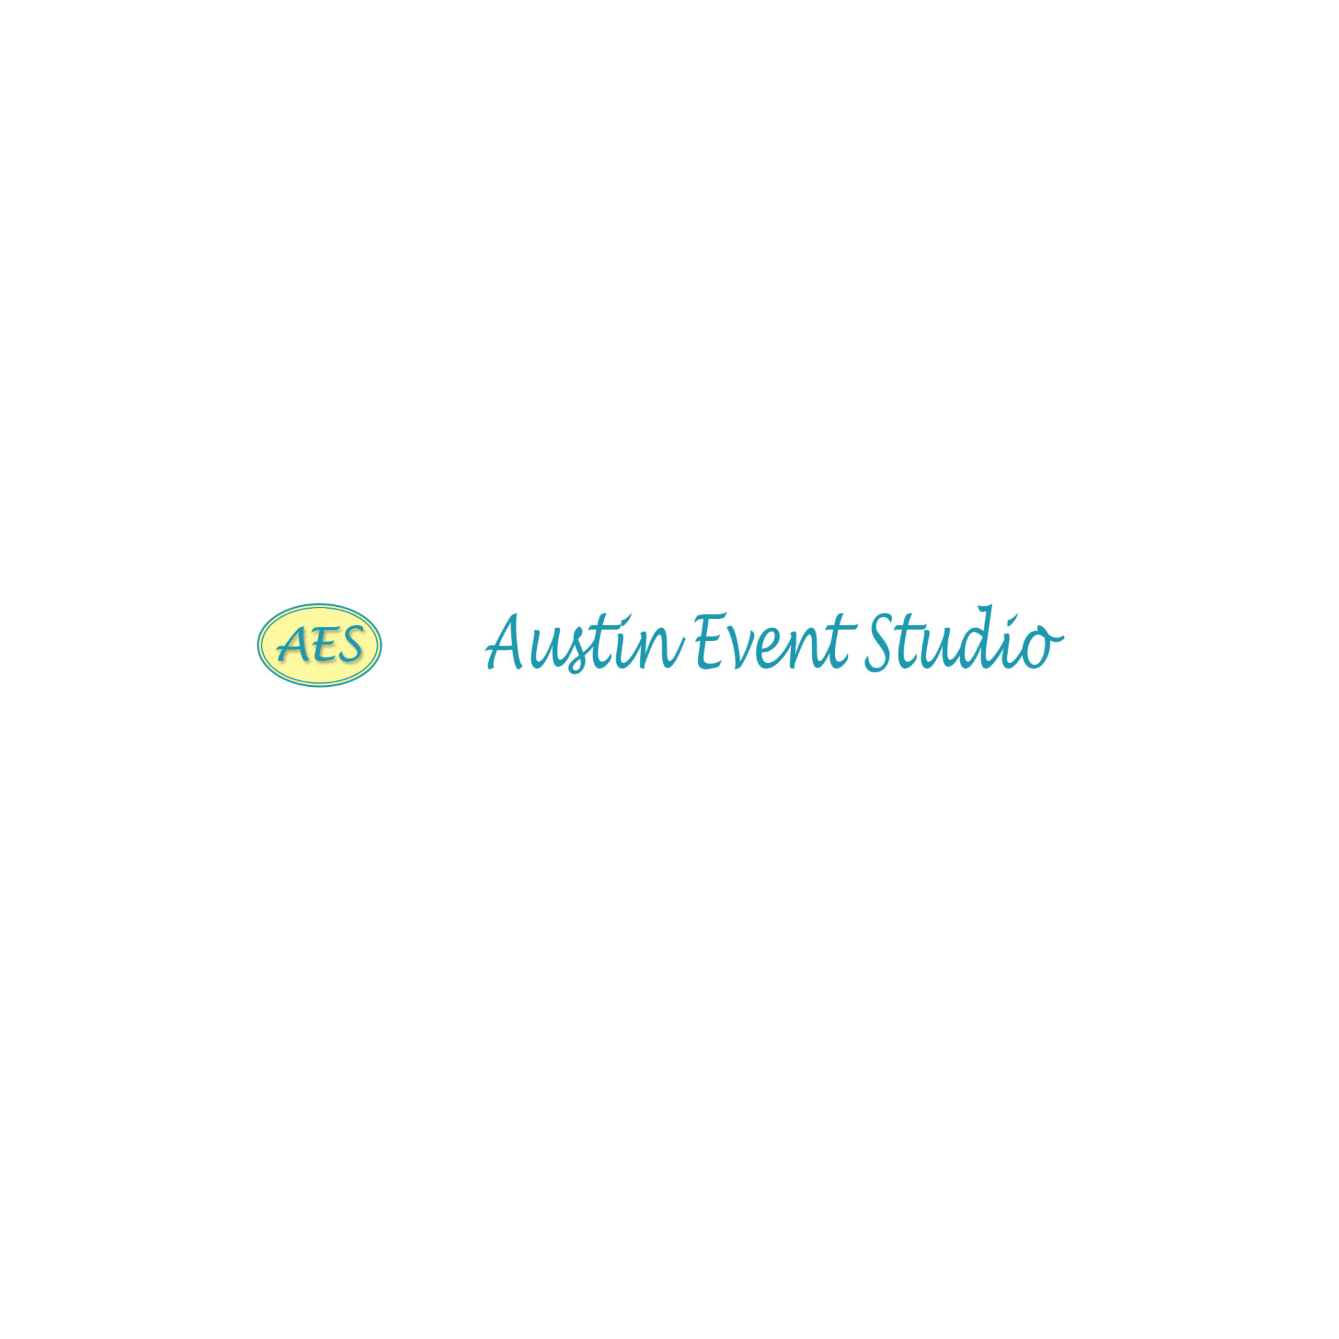 Austin Event Studio